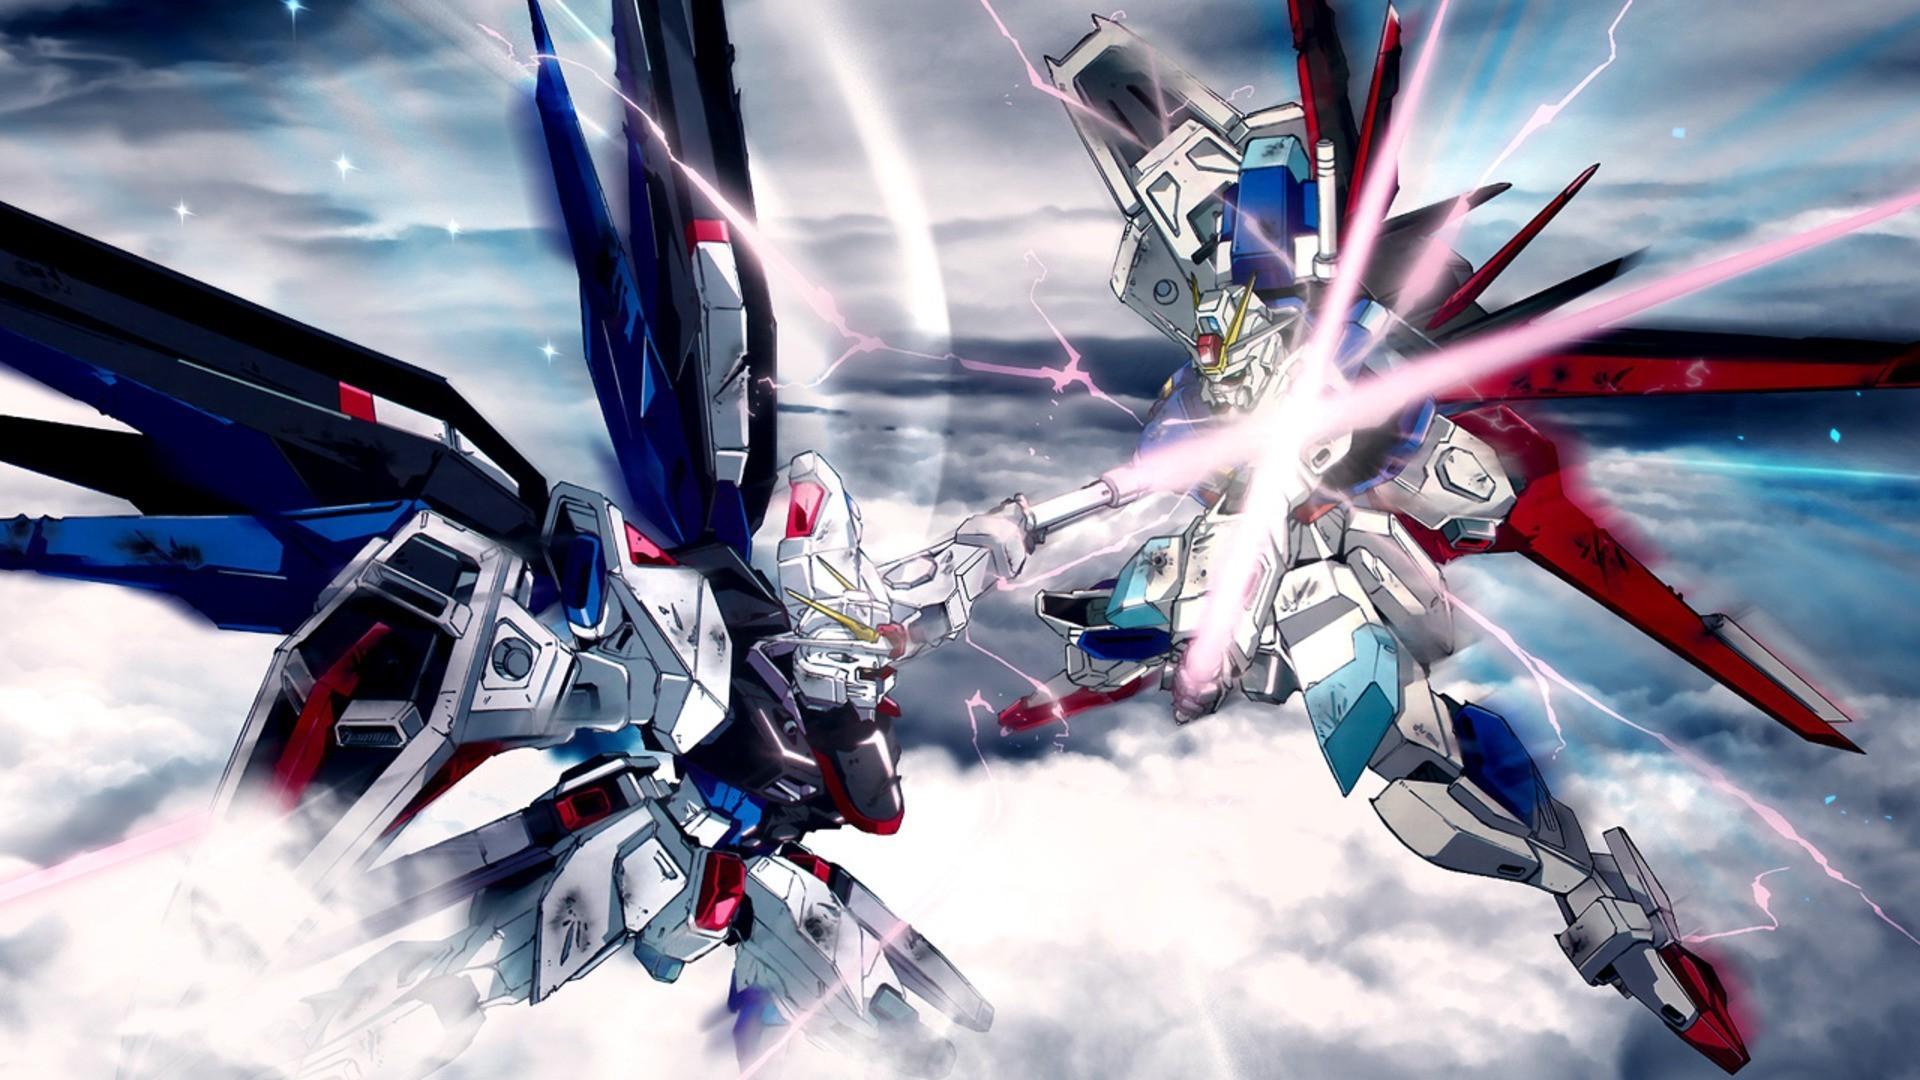 Gundam hd wallpaper wallpapertag - Gundam wallpaper hd ...